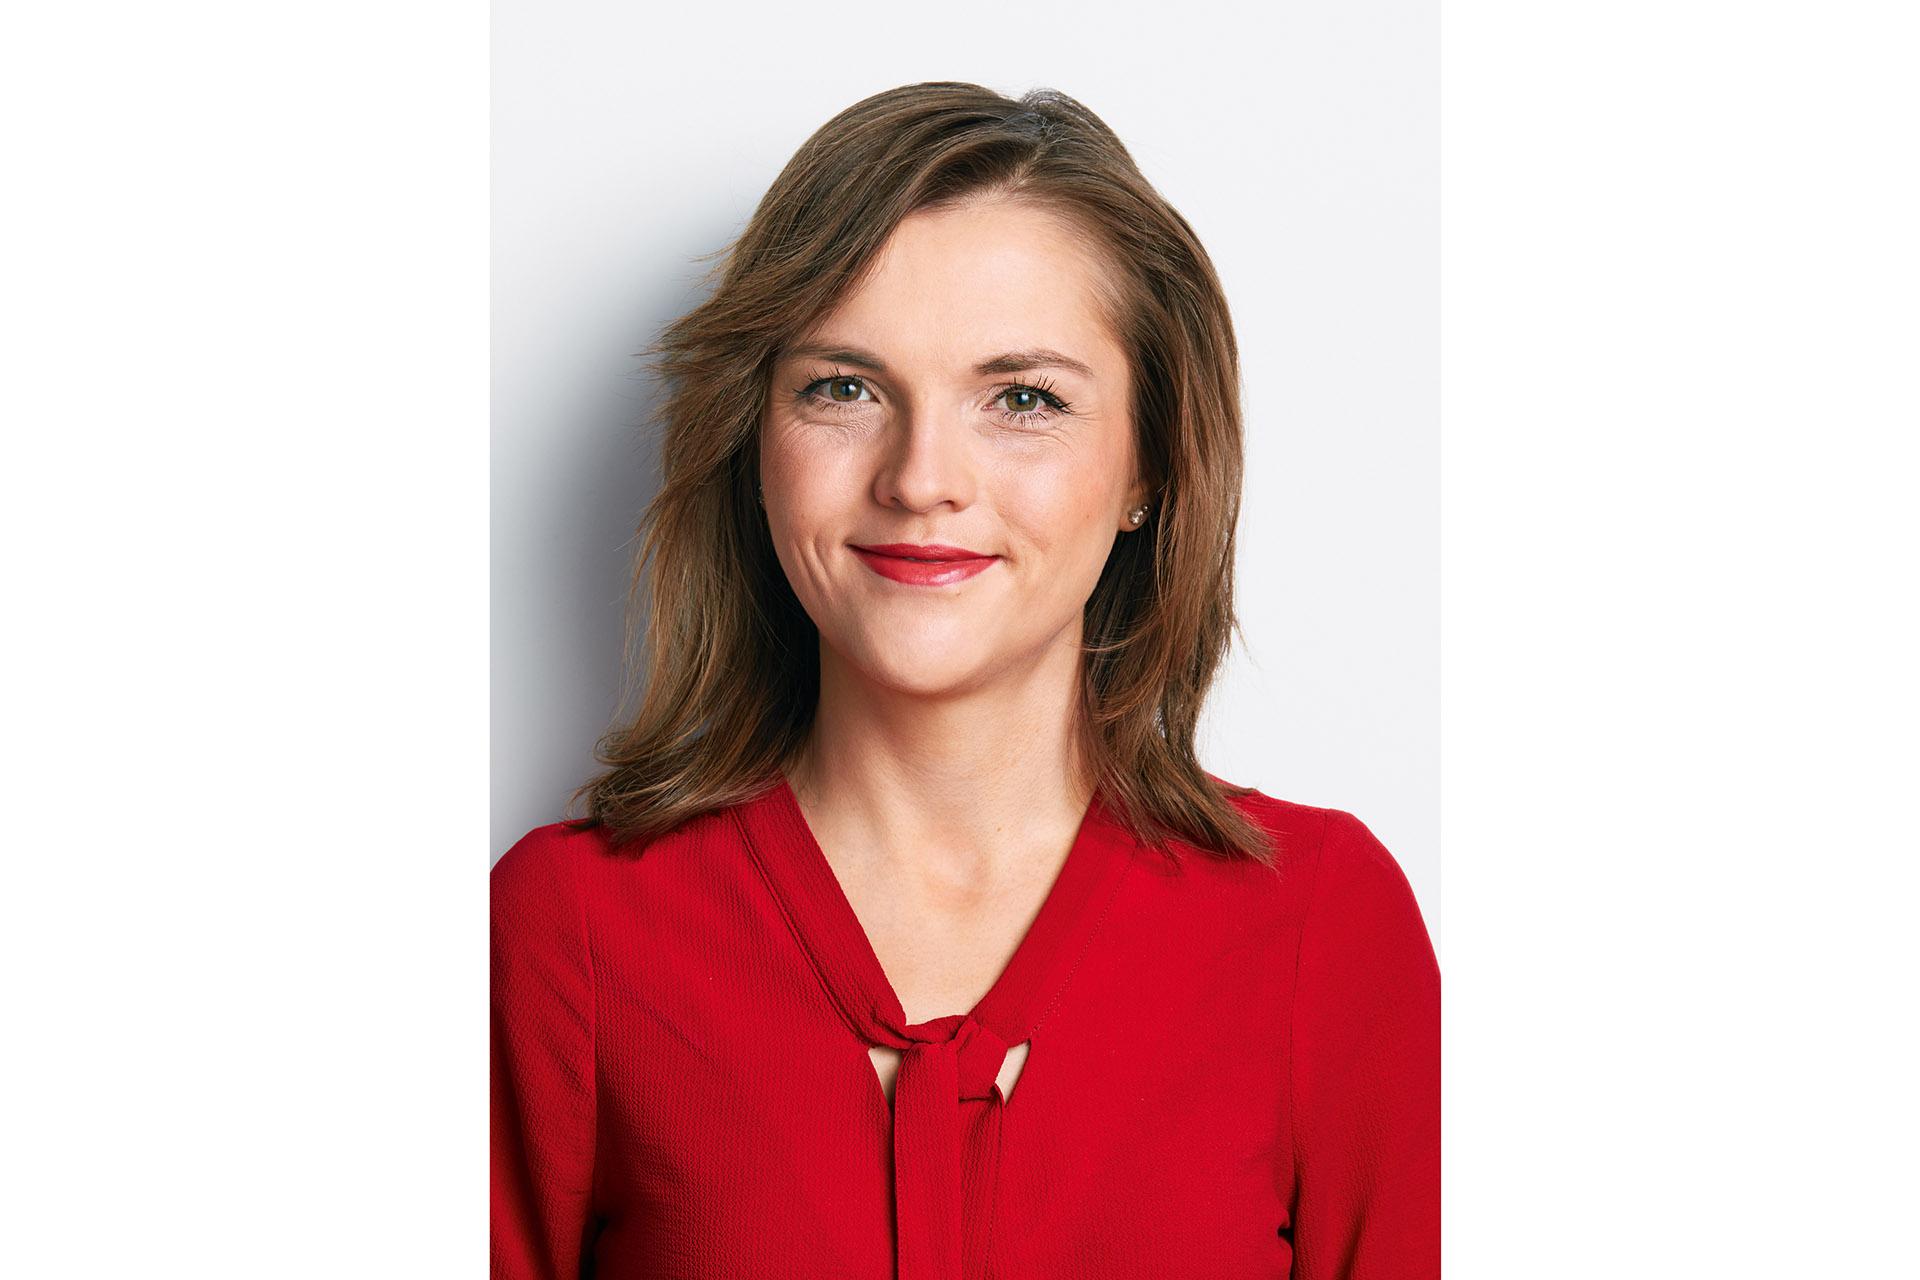 MdB Elsiabeth Kaiser